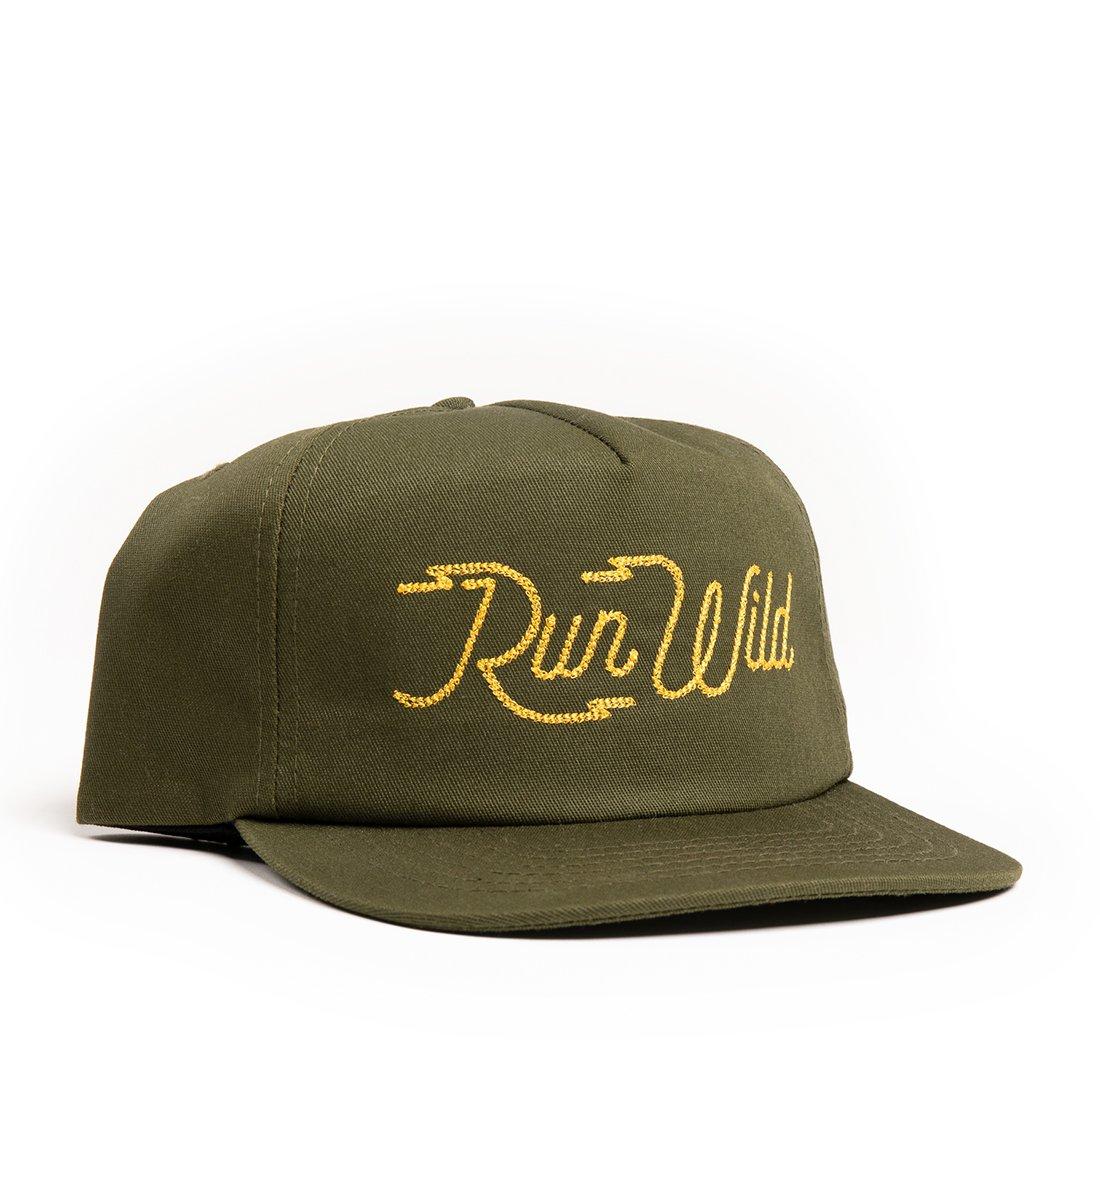 runwild-hat-front_2000x.jpg